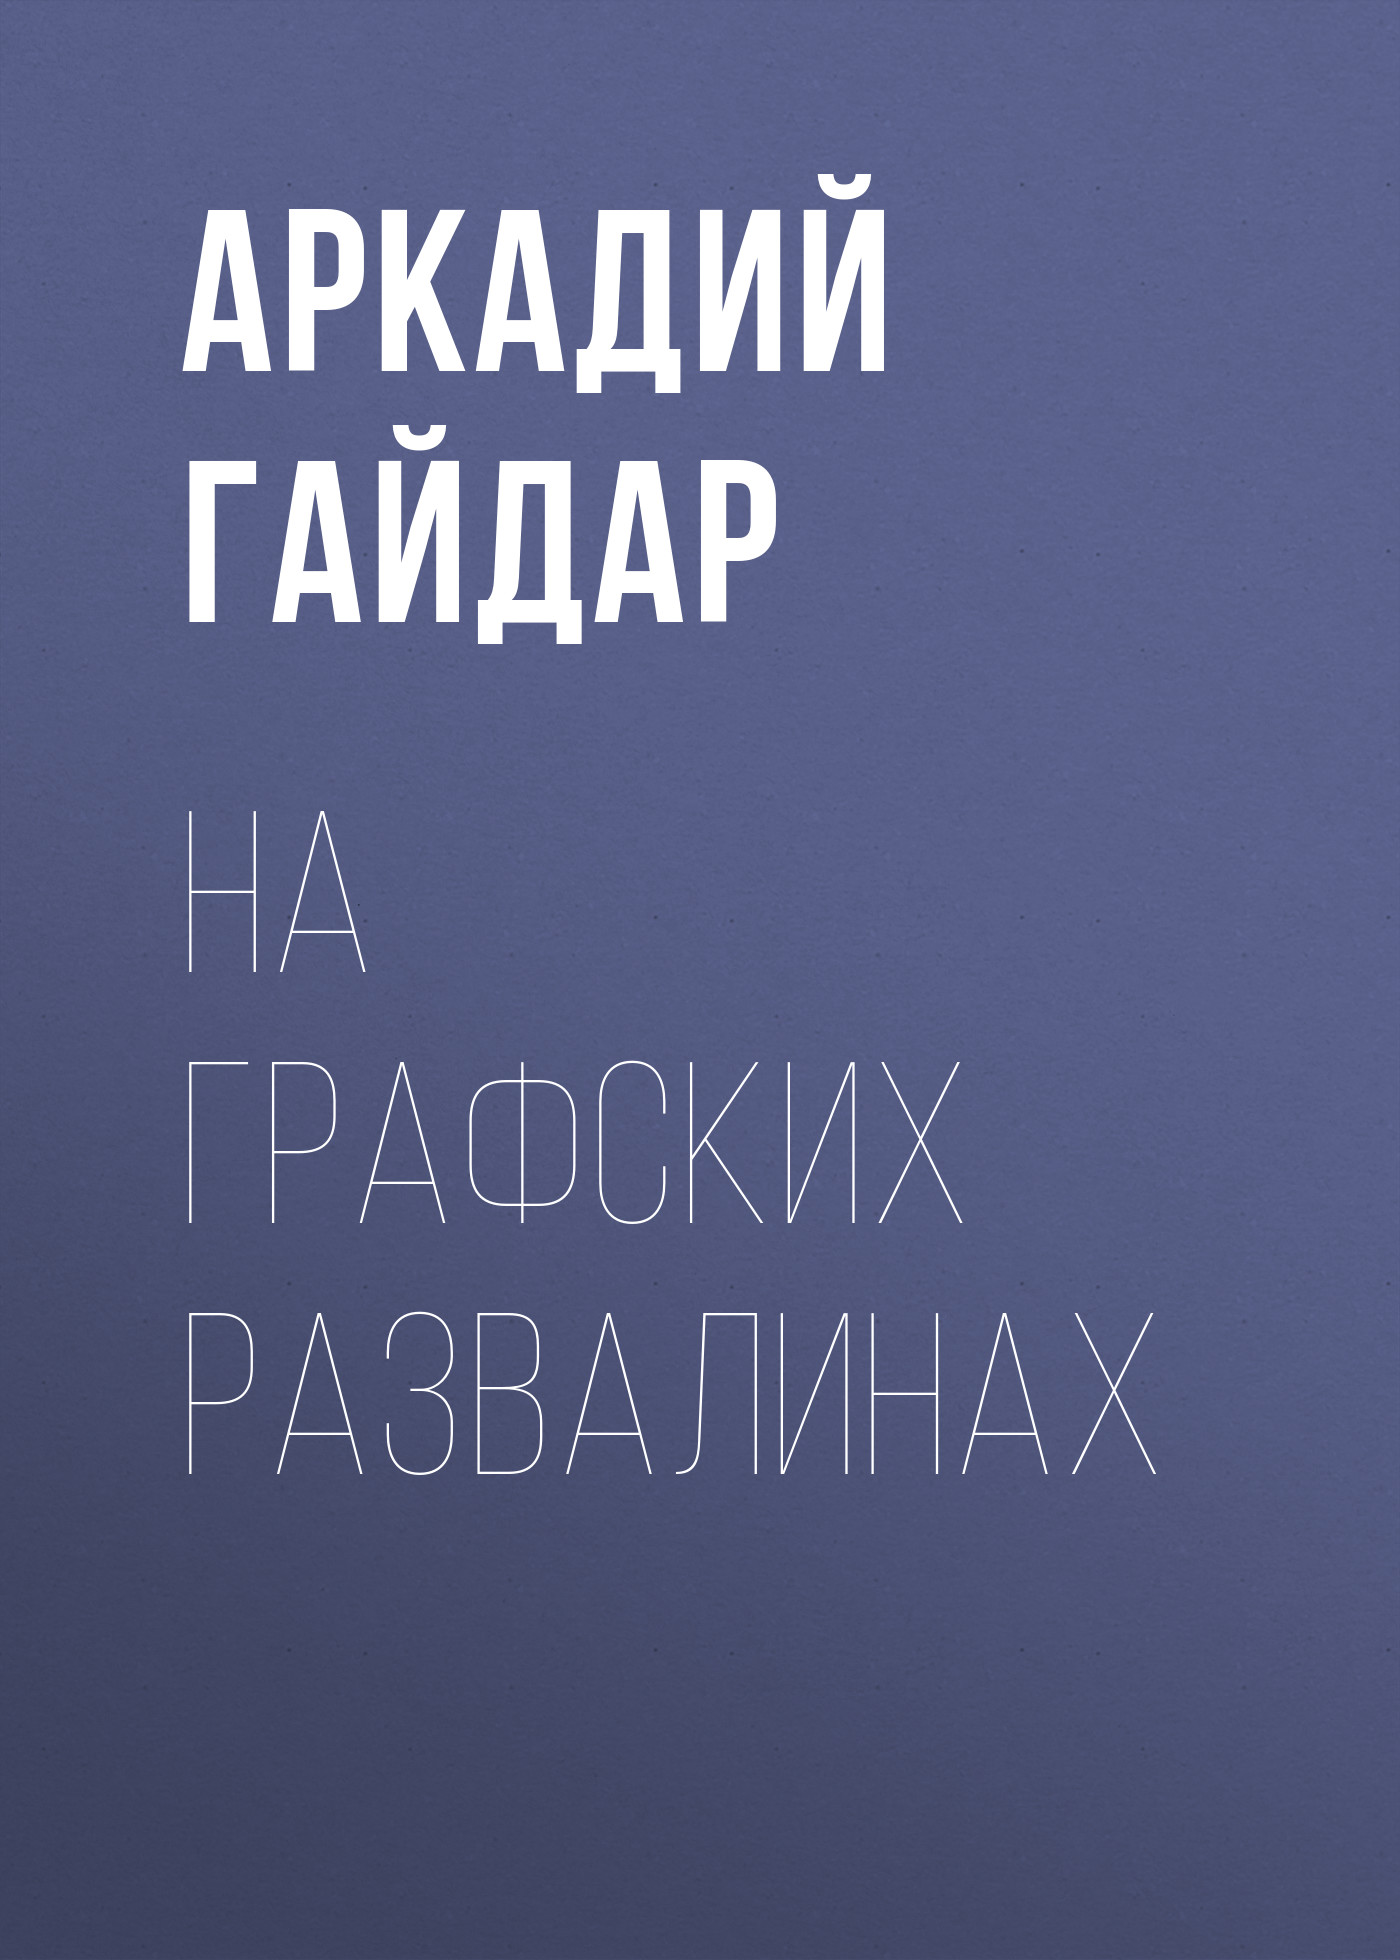 Аркадий Гайдар На графских развалинах вячеслав жуков на графских развалинах